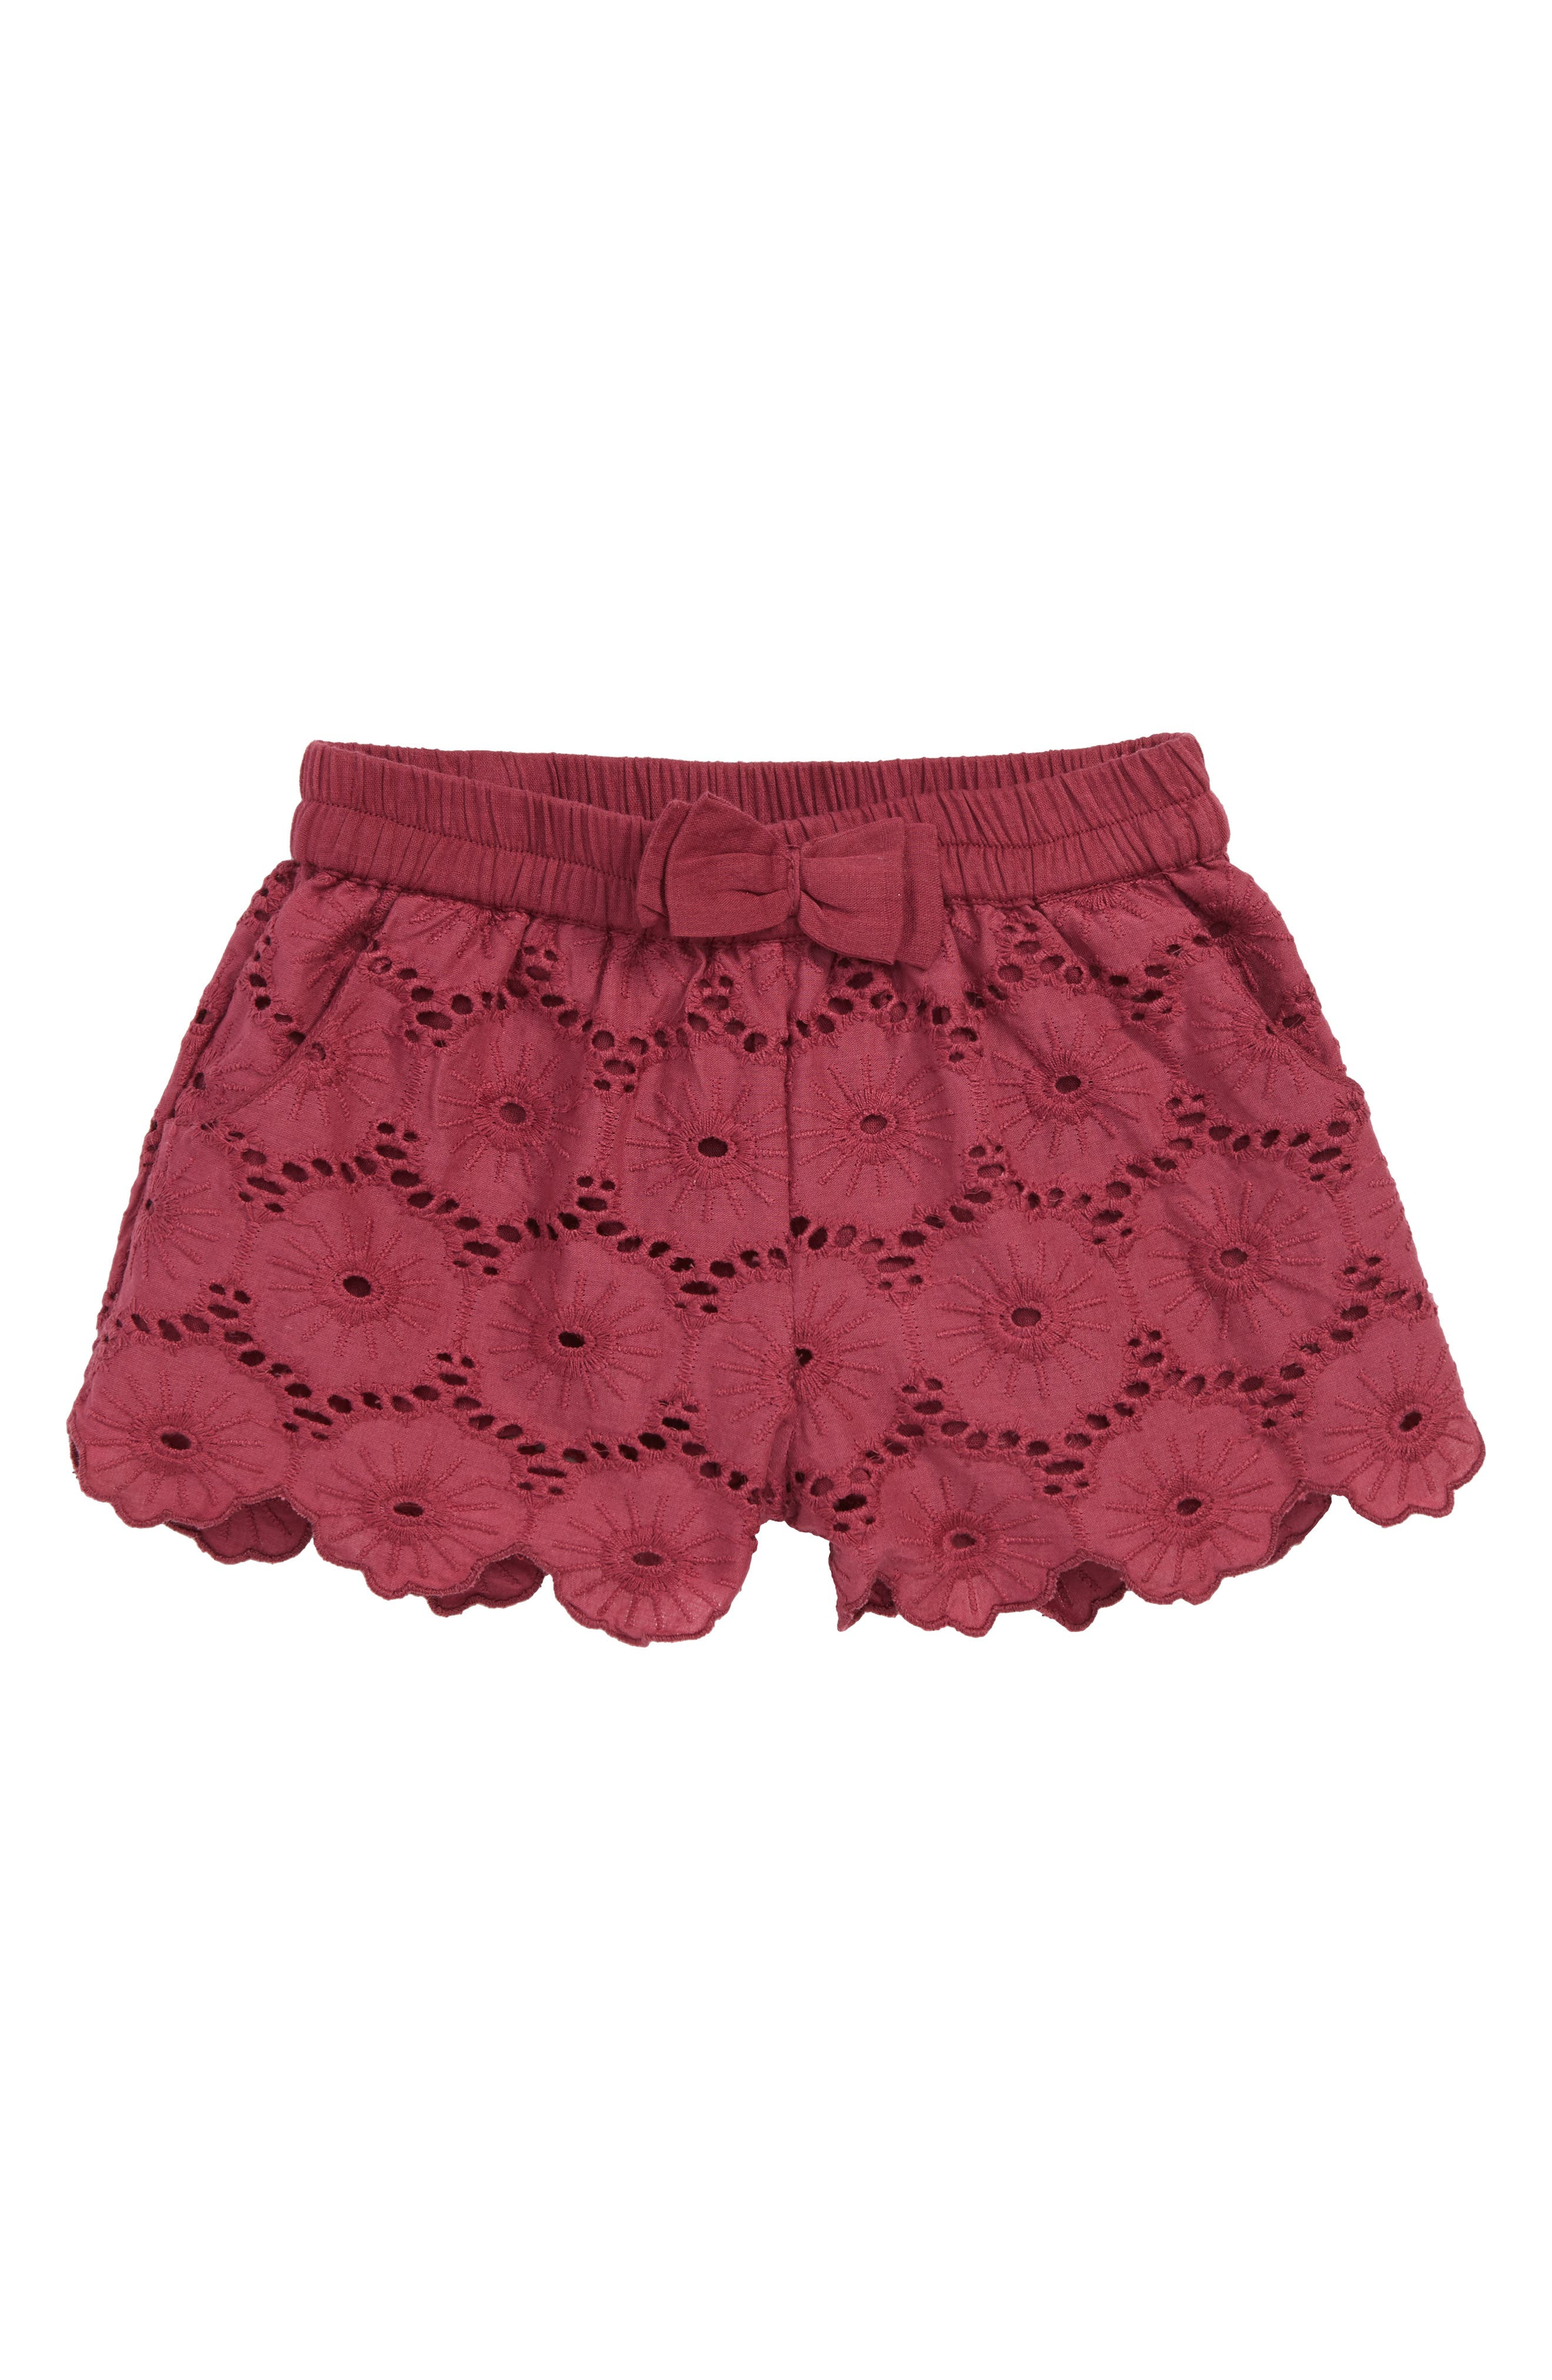 Christy Eyelet Embroidered Shorts,                             Main thumbnail 1, color,                             Maroon